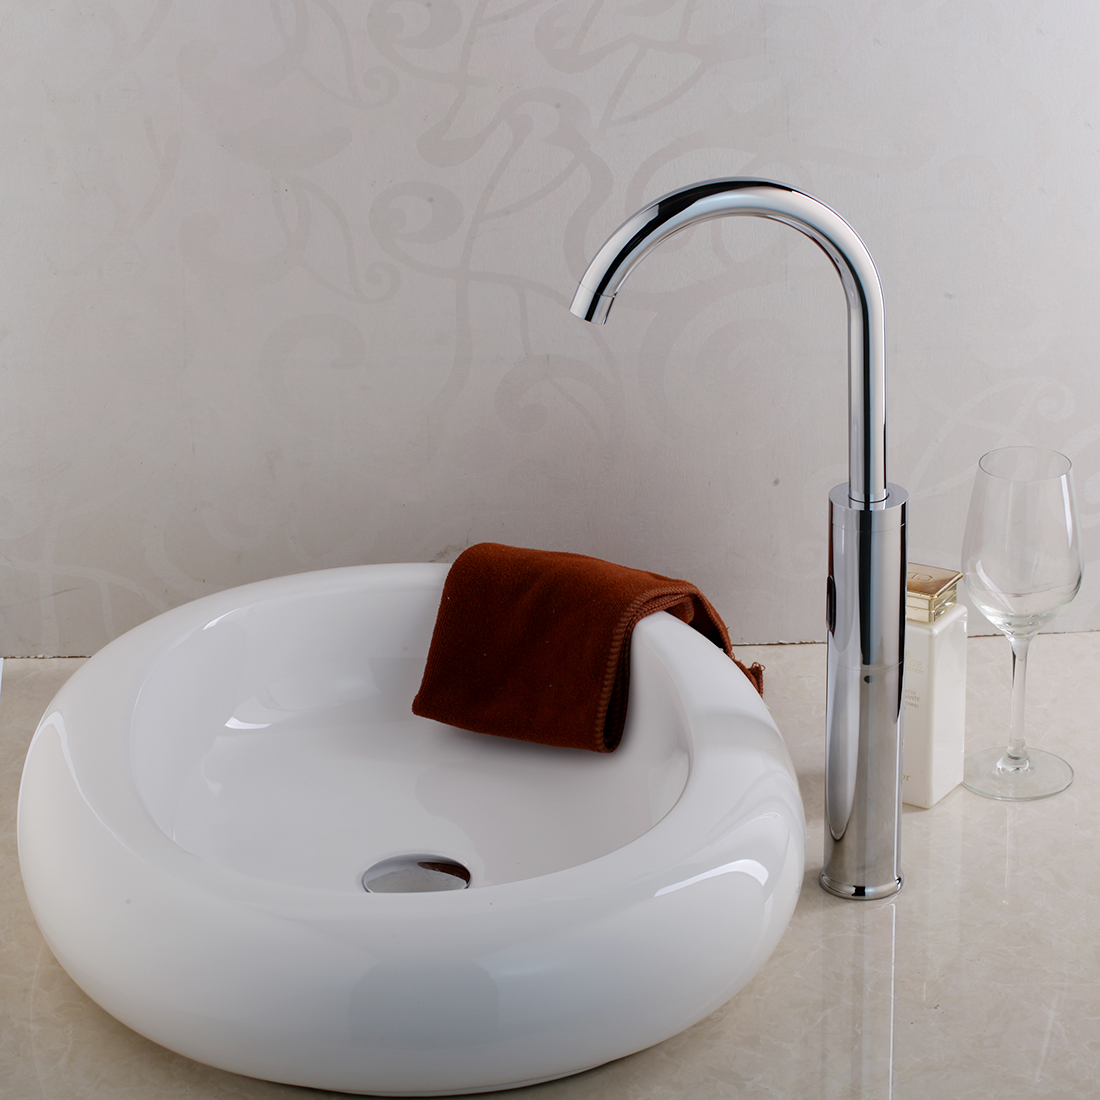 Round sink bowl Amazing Bathroom Details About Autosensor Taps Round White Porcelain Ceramic Vessel Sink Bowl Faucet Combo Ebay Autosensor Taps Round White Porcelain Ceramic Vessel Sink Bowl